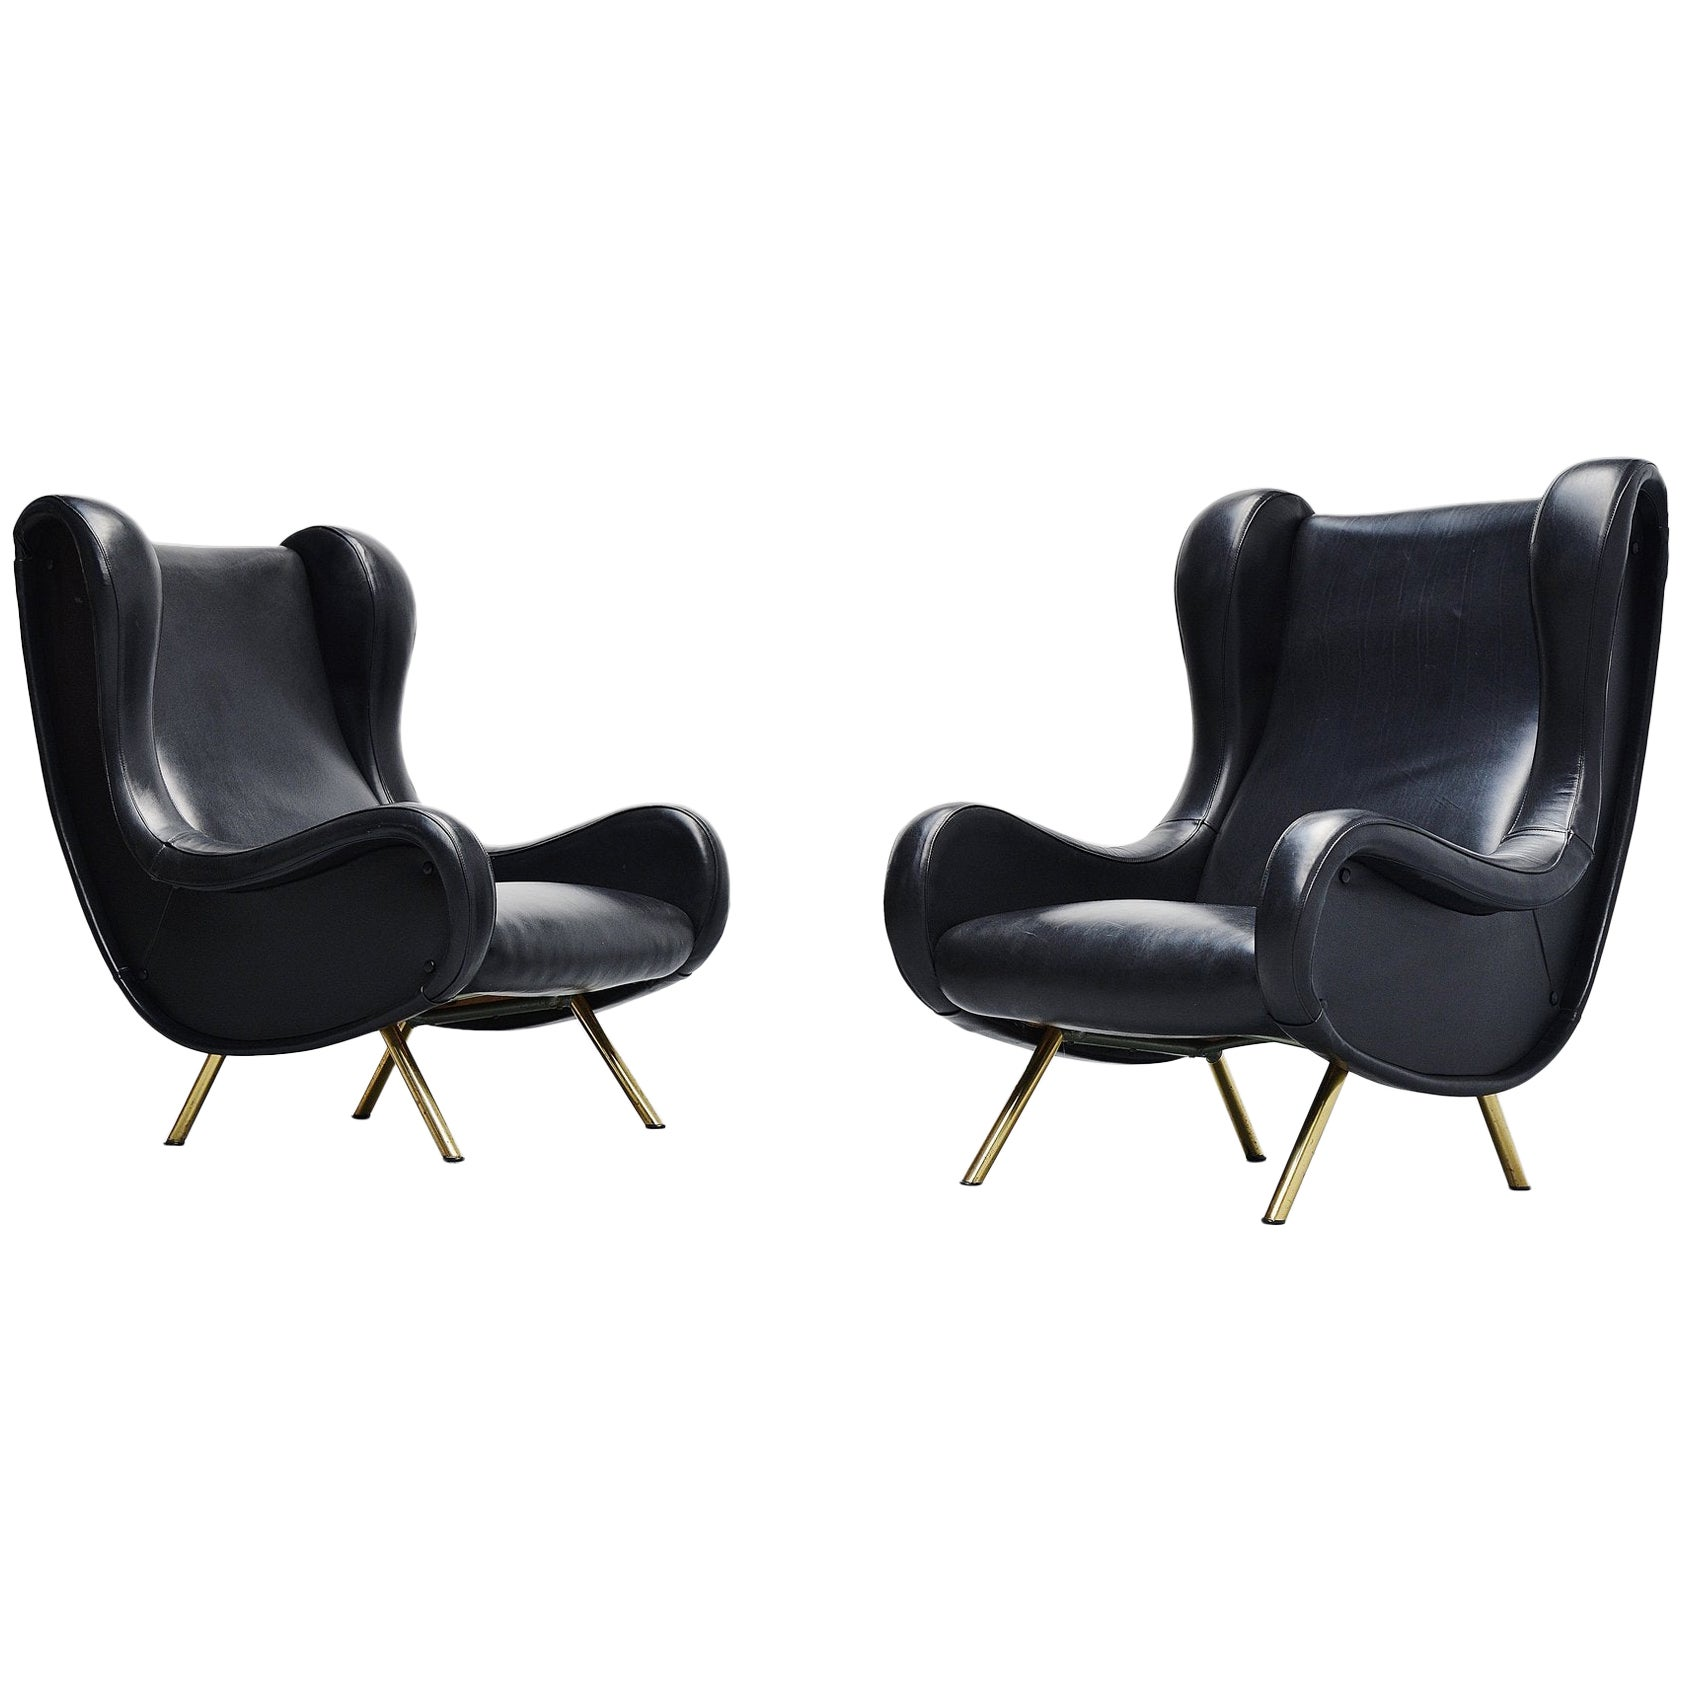 Marco Zanuso Senior Lounge Chairs Arflex, Italy, 1951